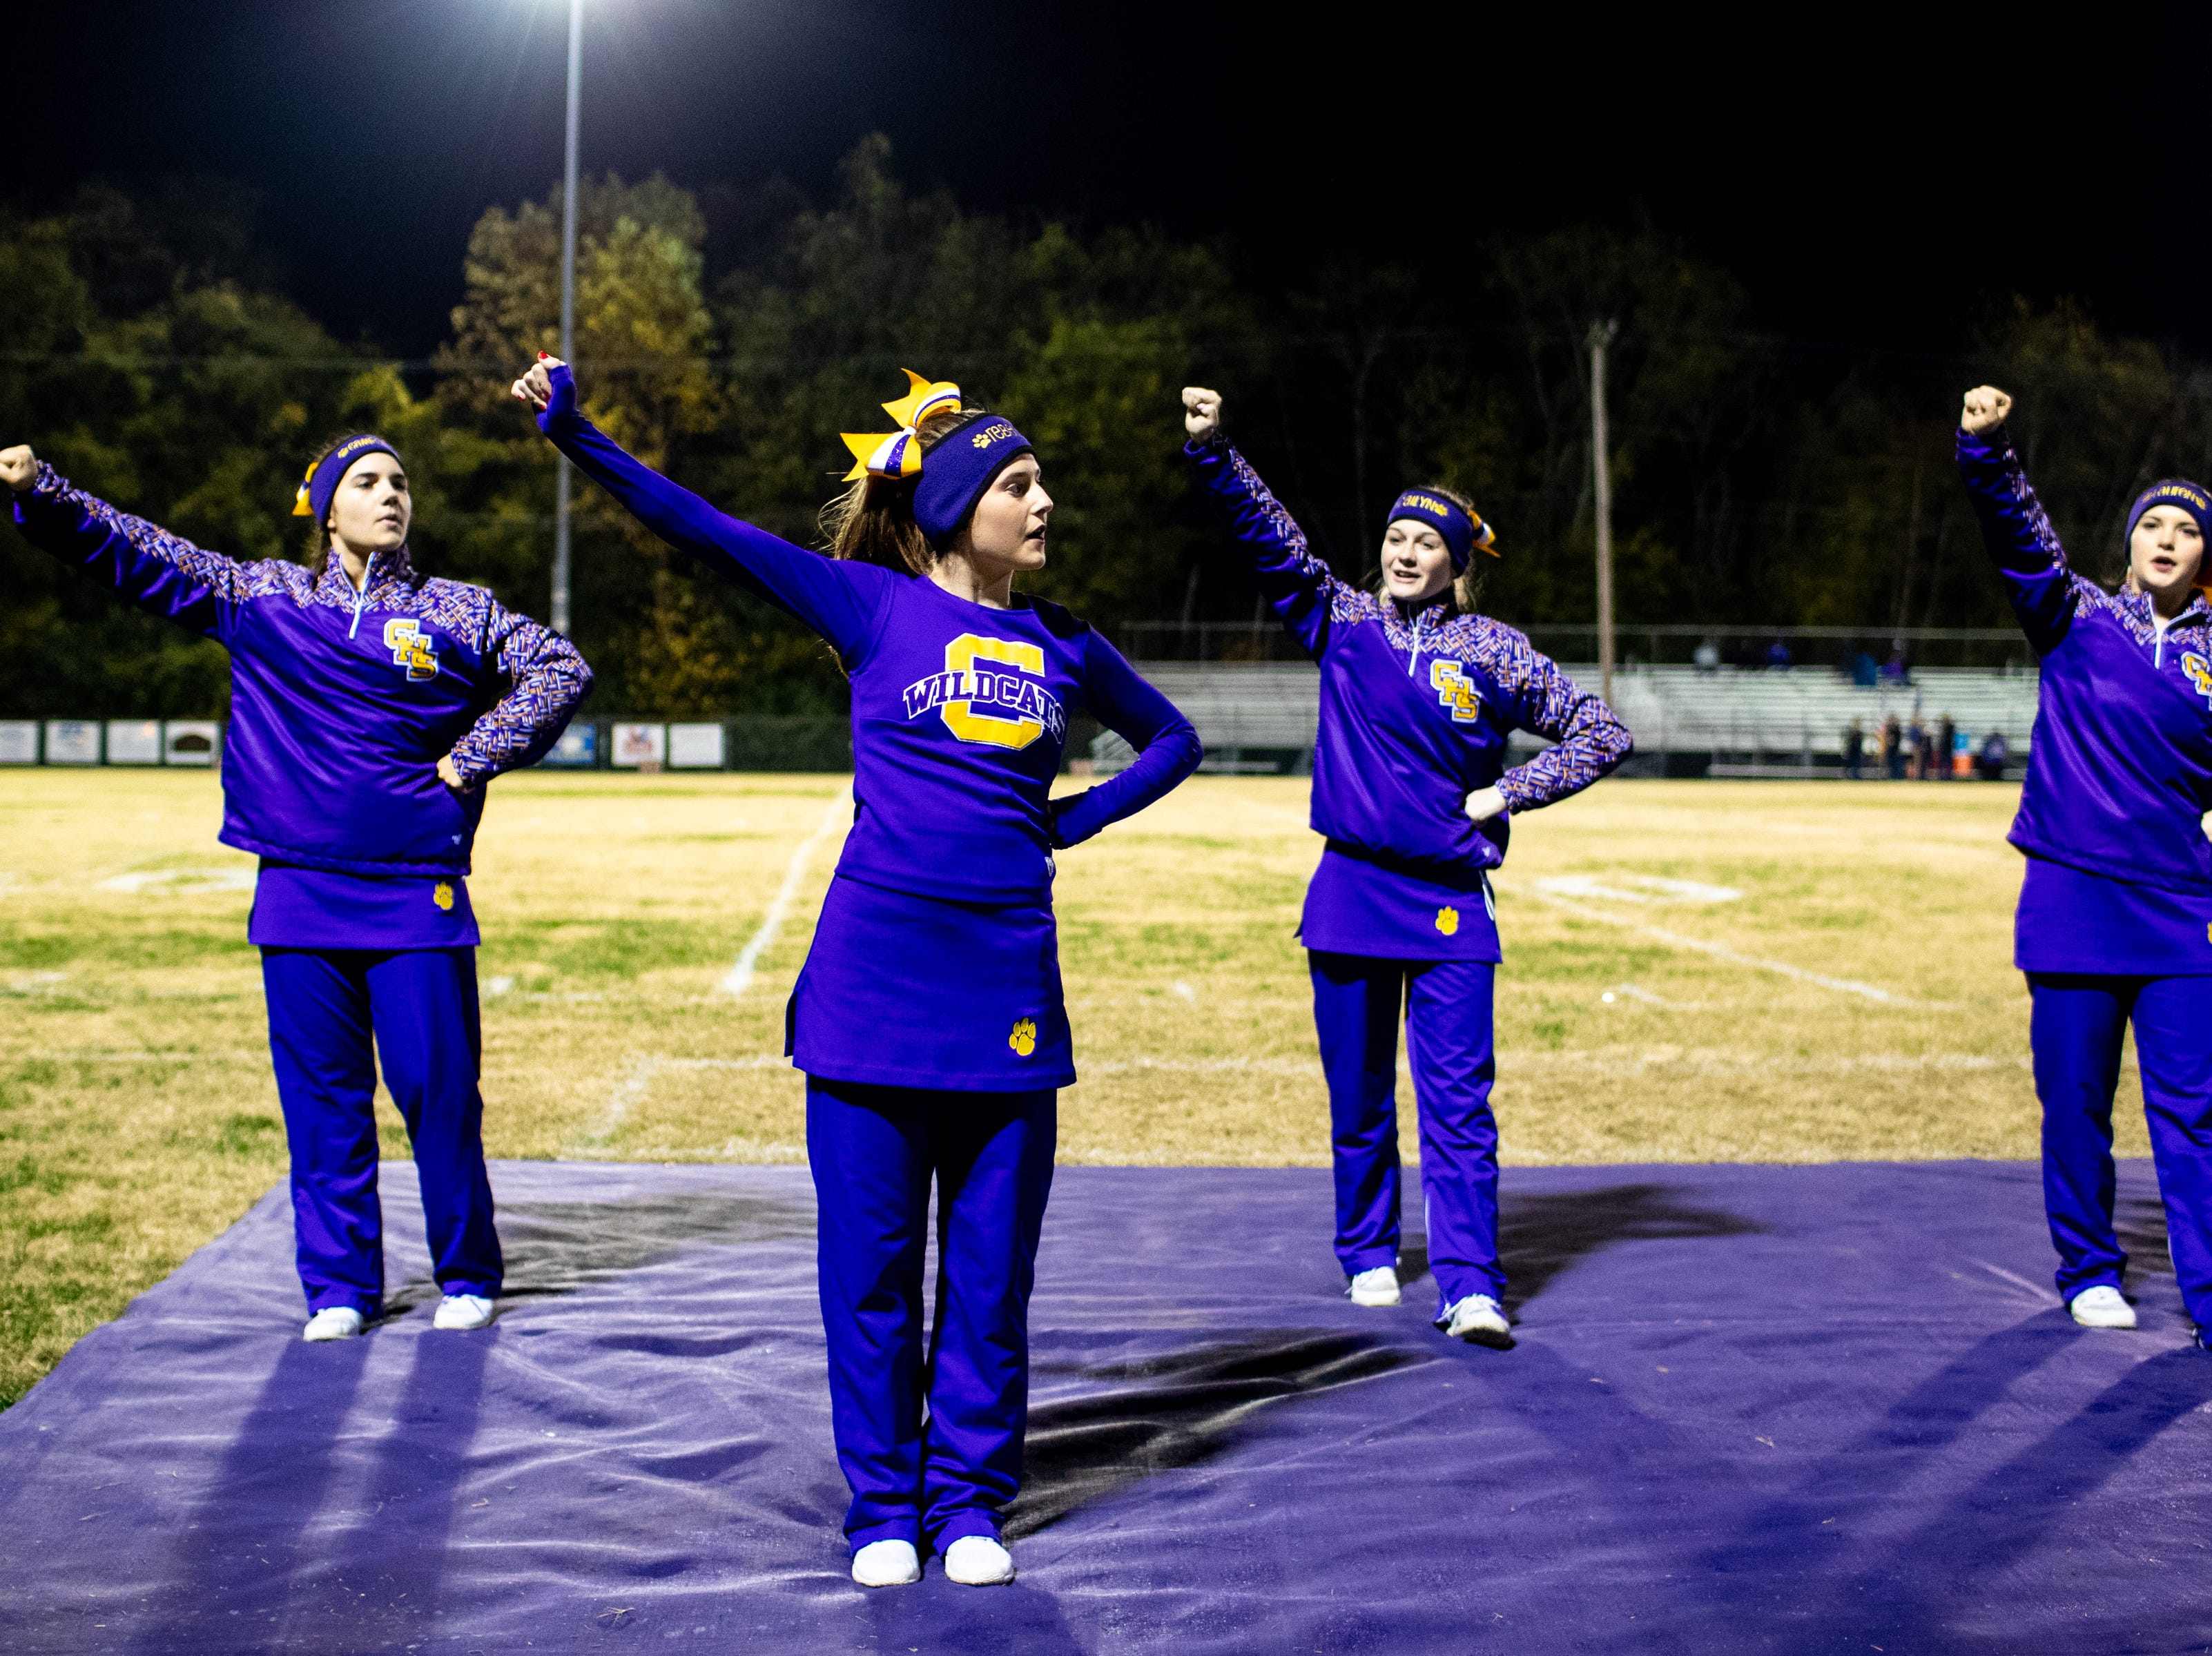 Clarksville High cheerleaders warm up before the game at Clarksville High Friday, Nov. 2, 2018, in Clarksville, Tenn.